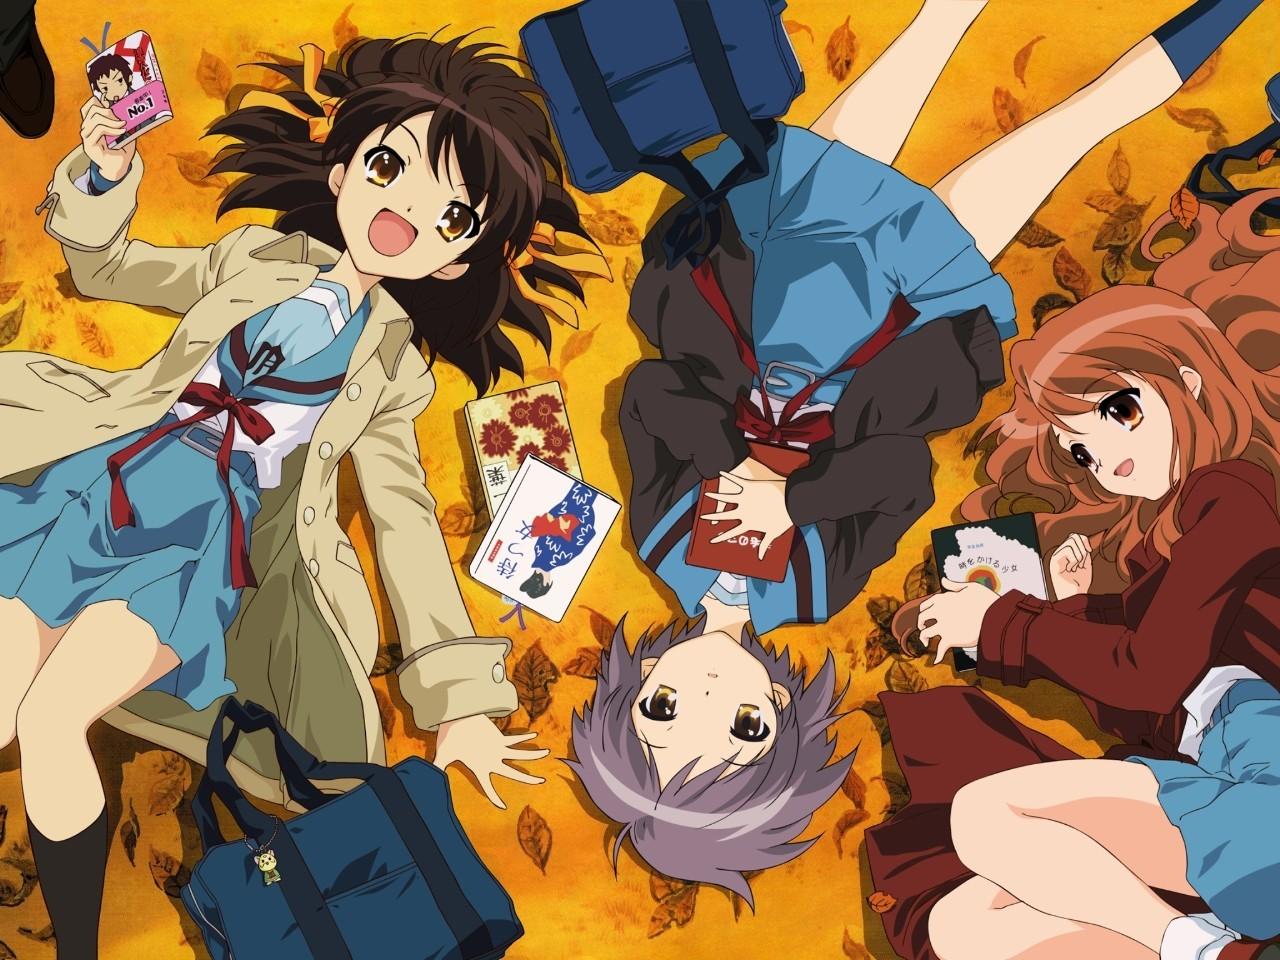 Anime Couple The Melancholy Of Haruhi Suzumiya Fall Wallpapers 1280x960